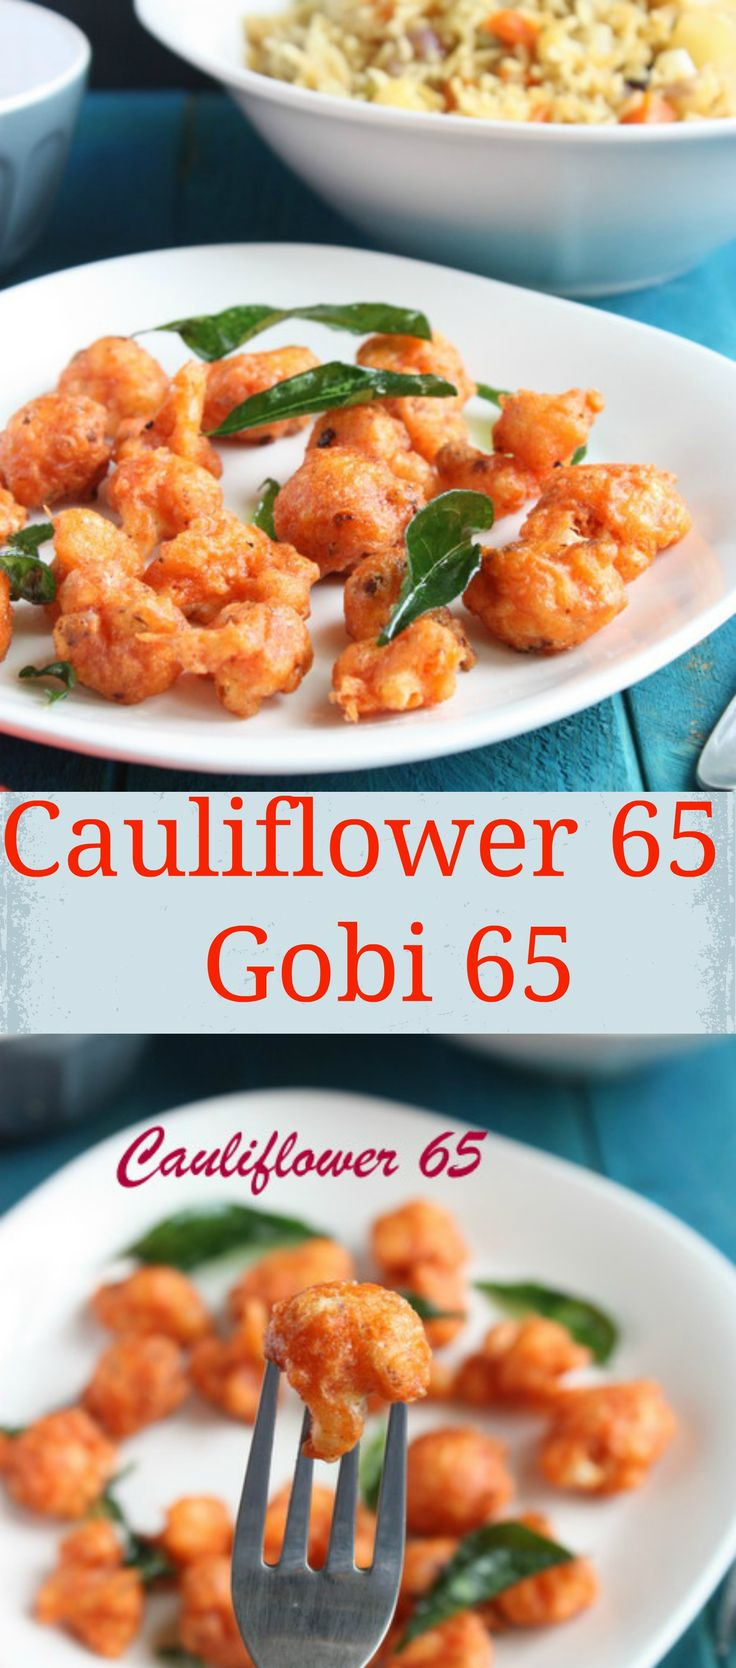 Cauliflower 65 | Gobi 65 | Evening Snacks